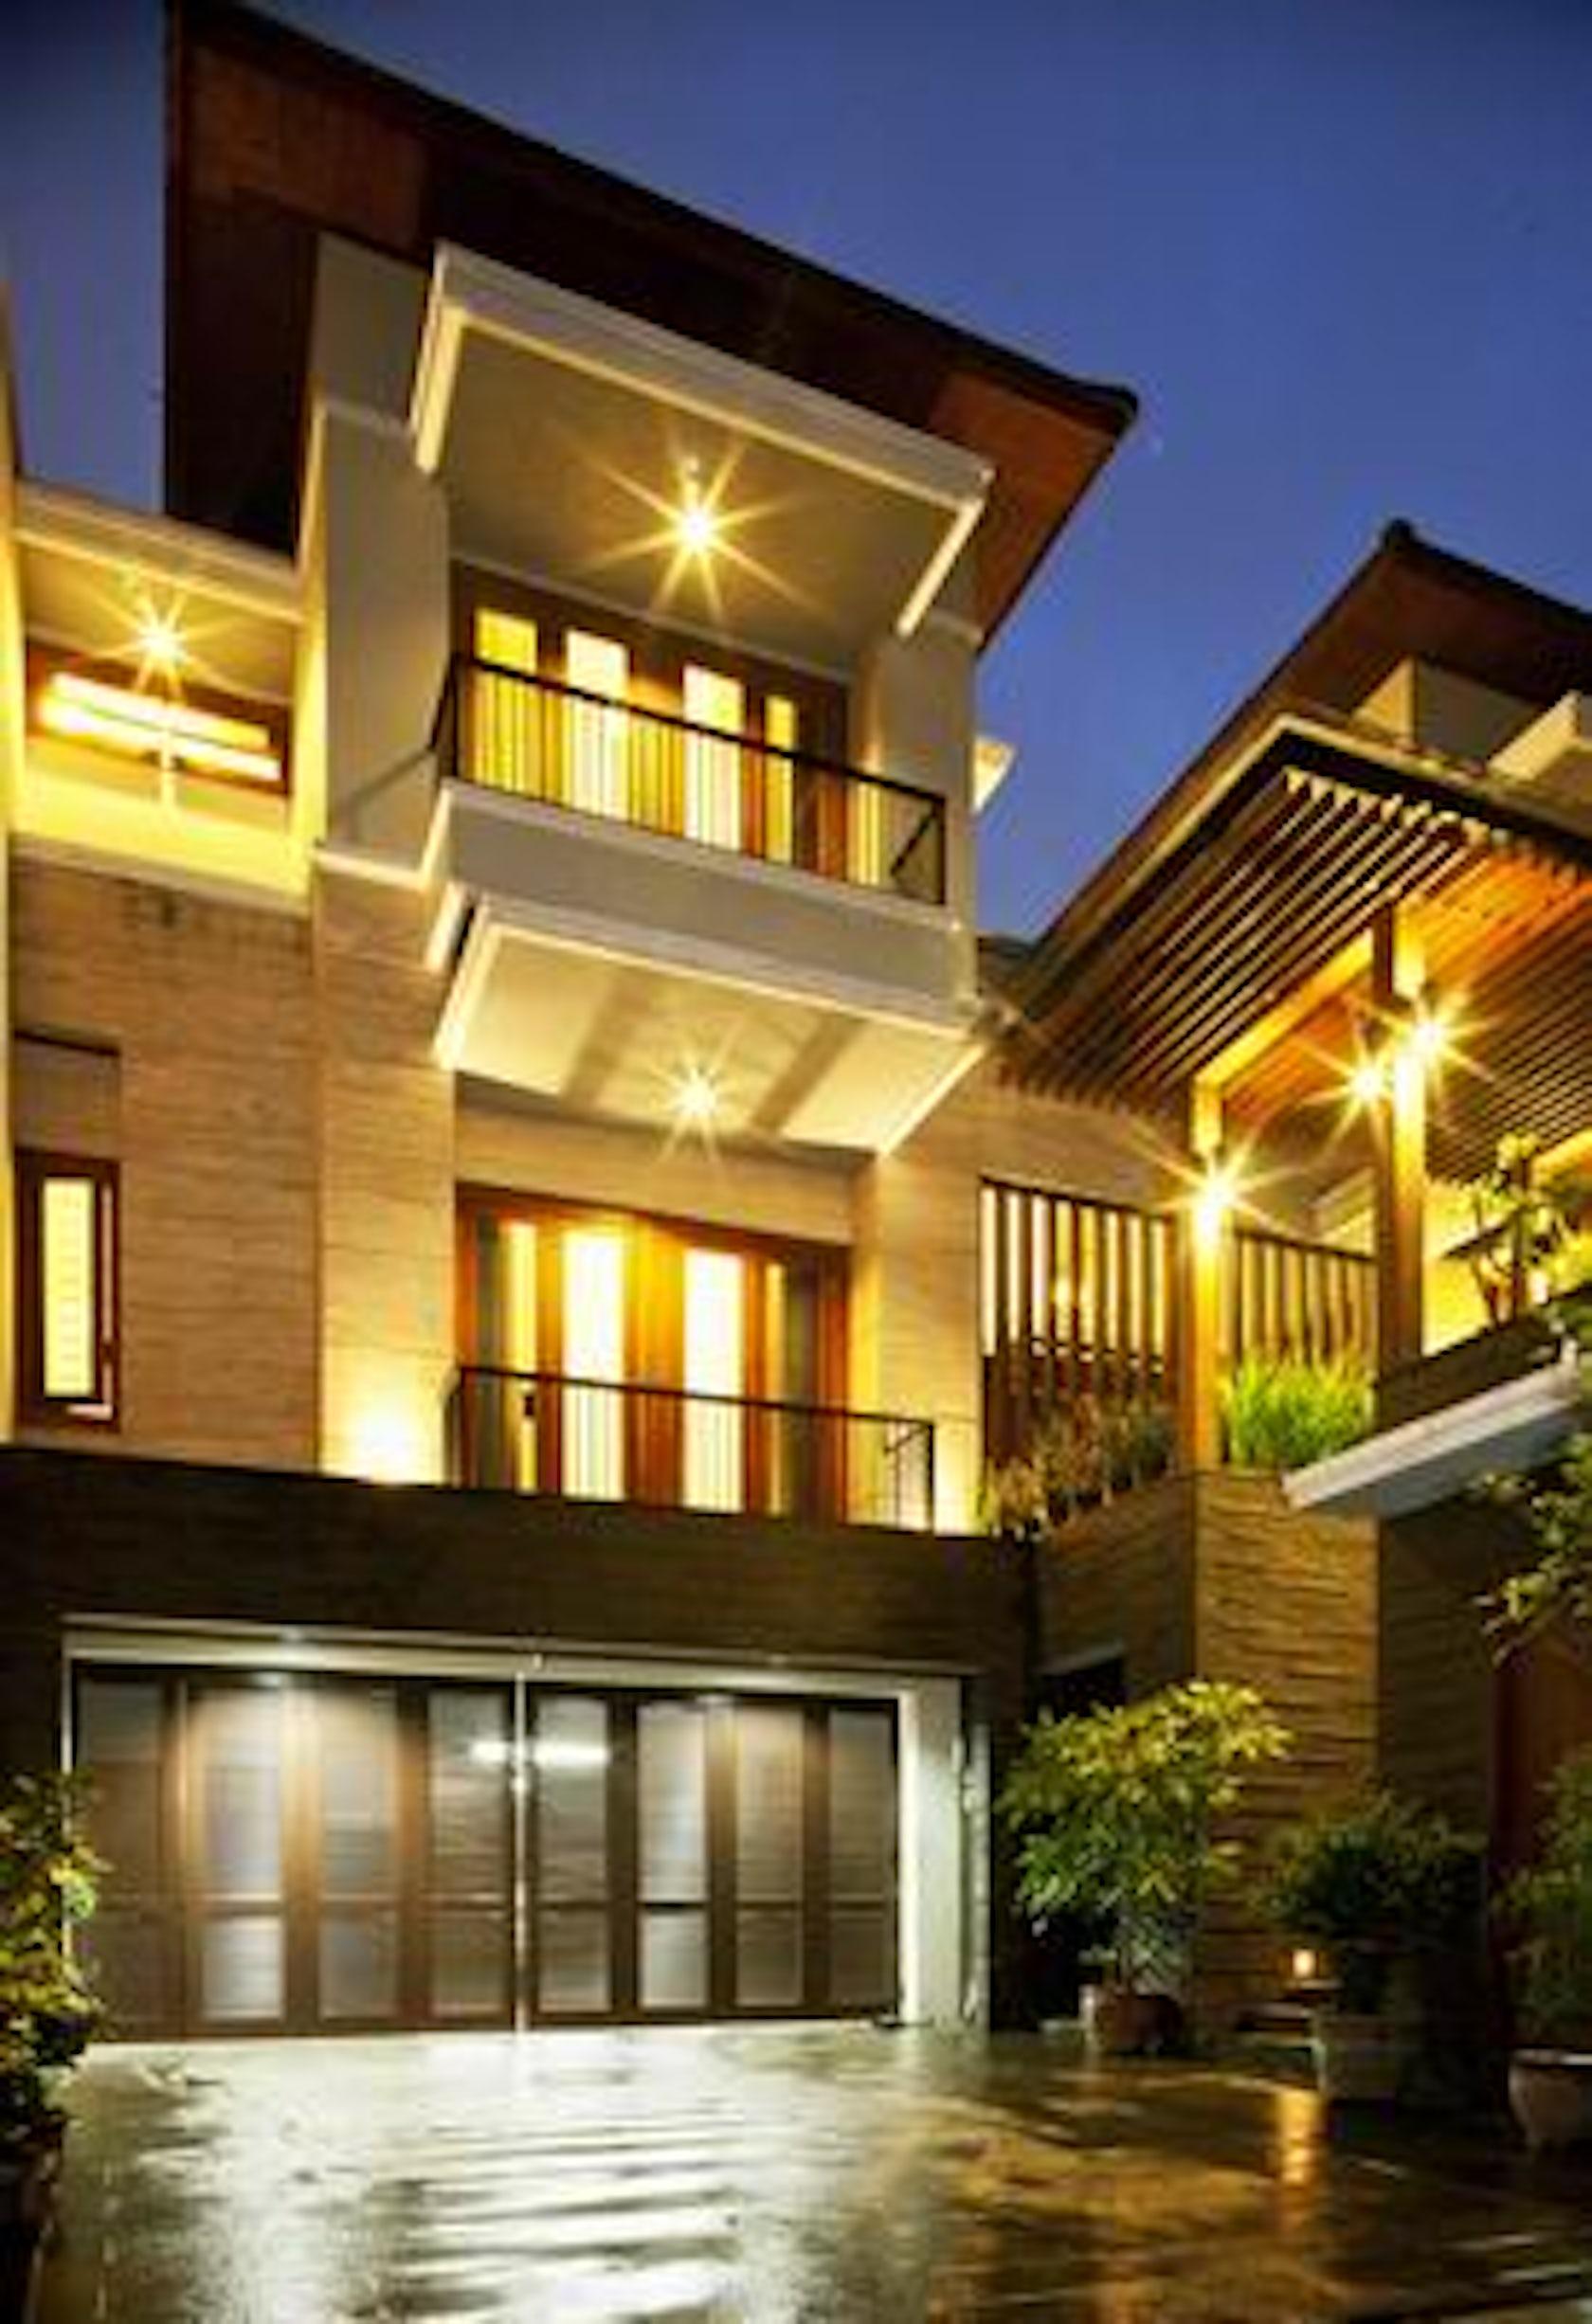 Contemporary Homes With Cedar Siding Modern Cedar Siding: Tropical Balinese Modern House